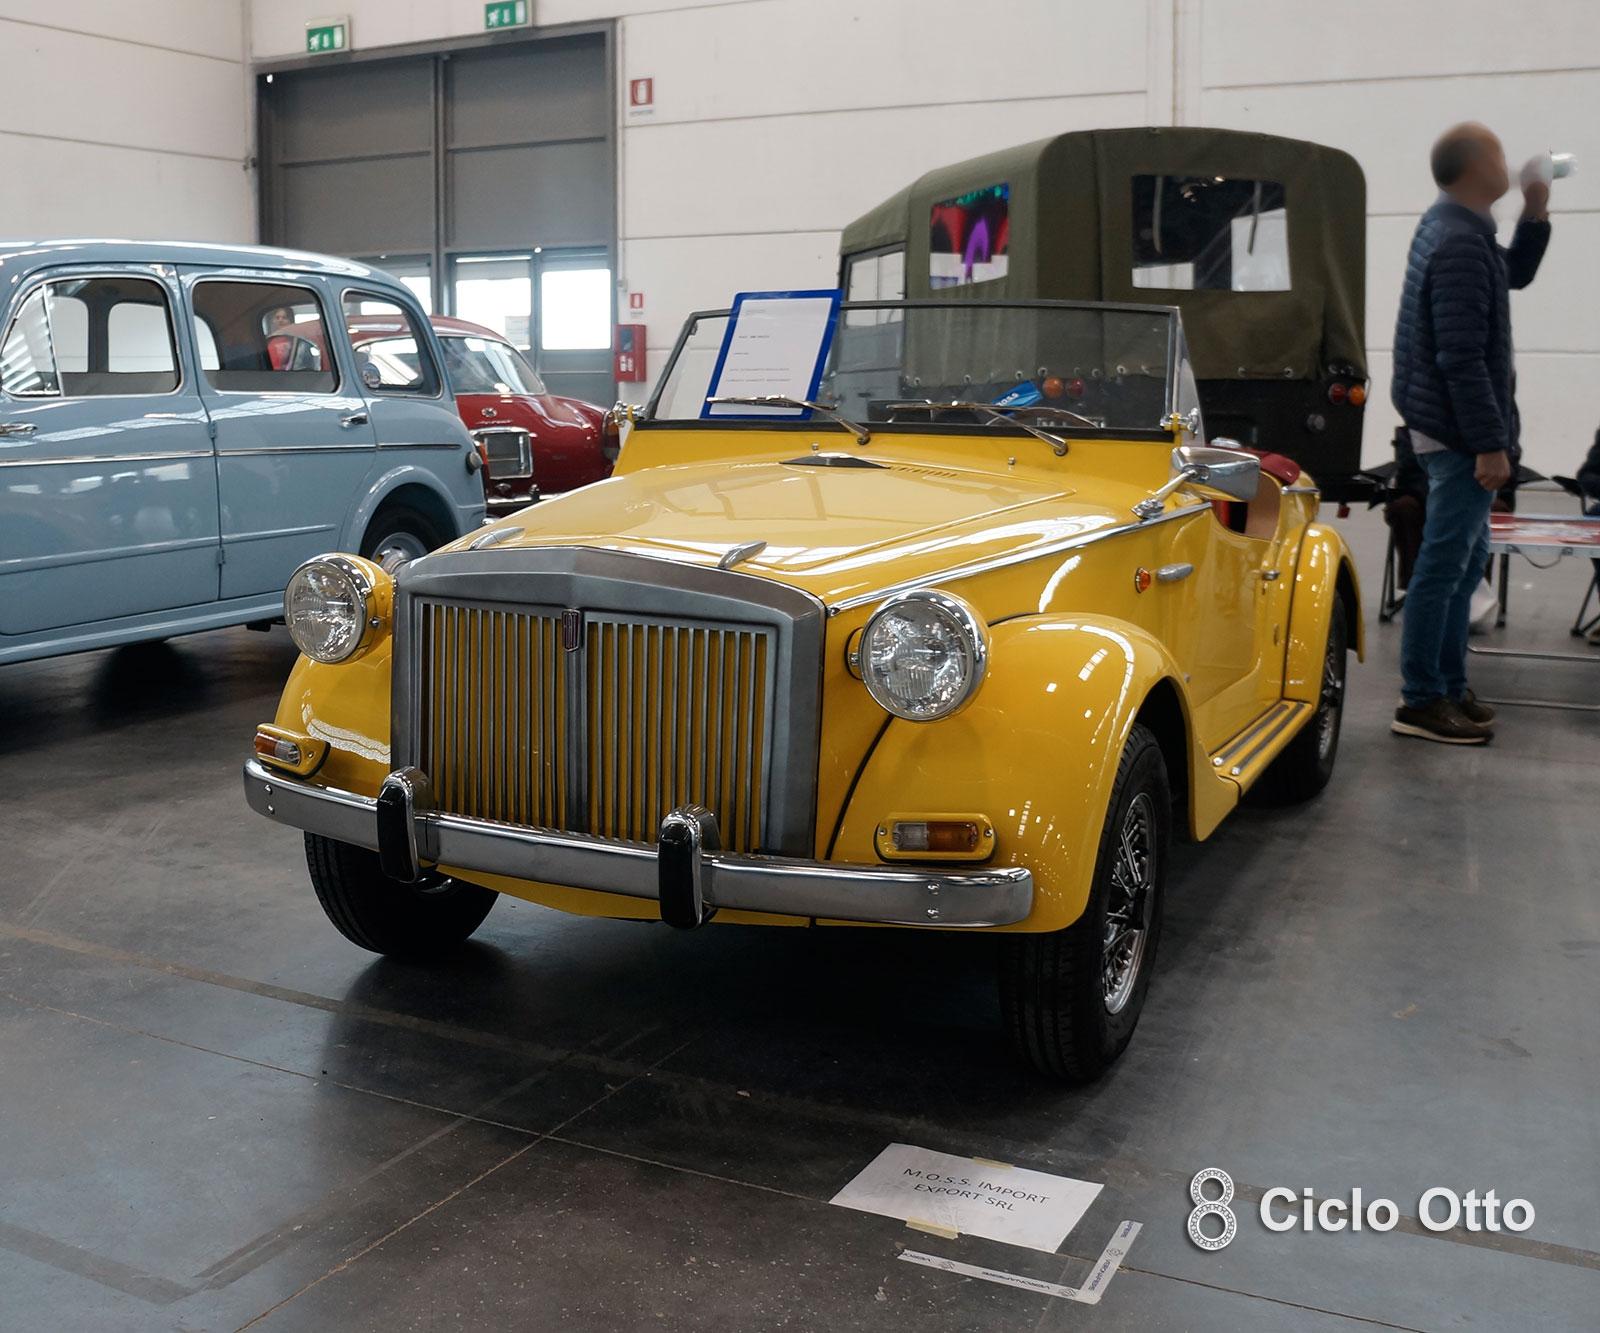 Siata 850 Spring 1967 - Verona Legend Cars 2019